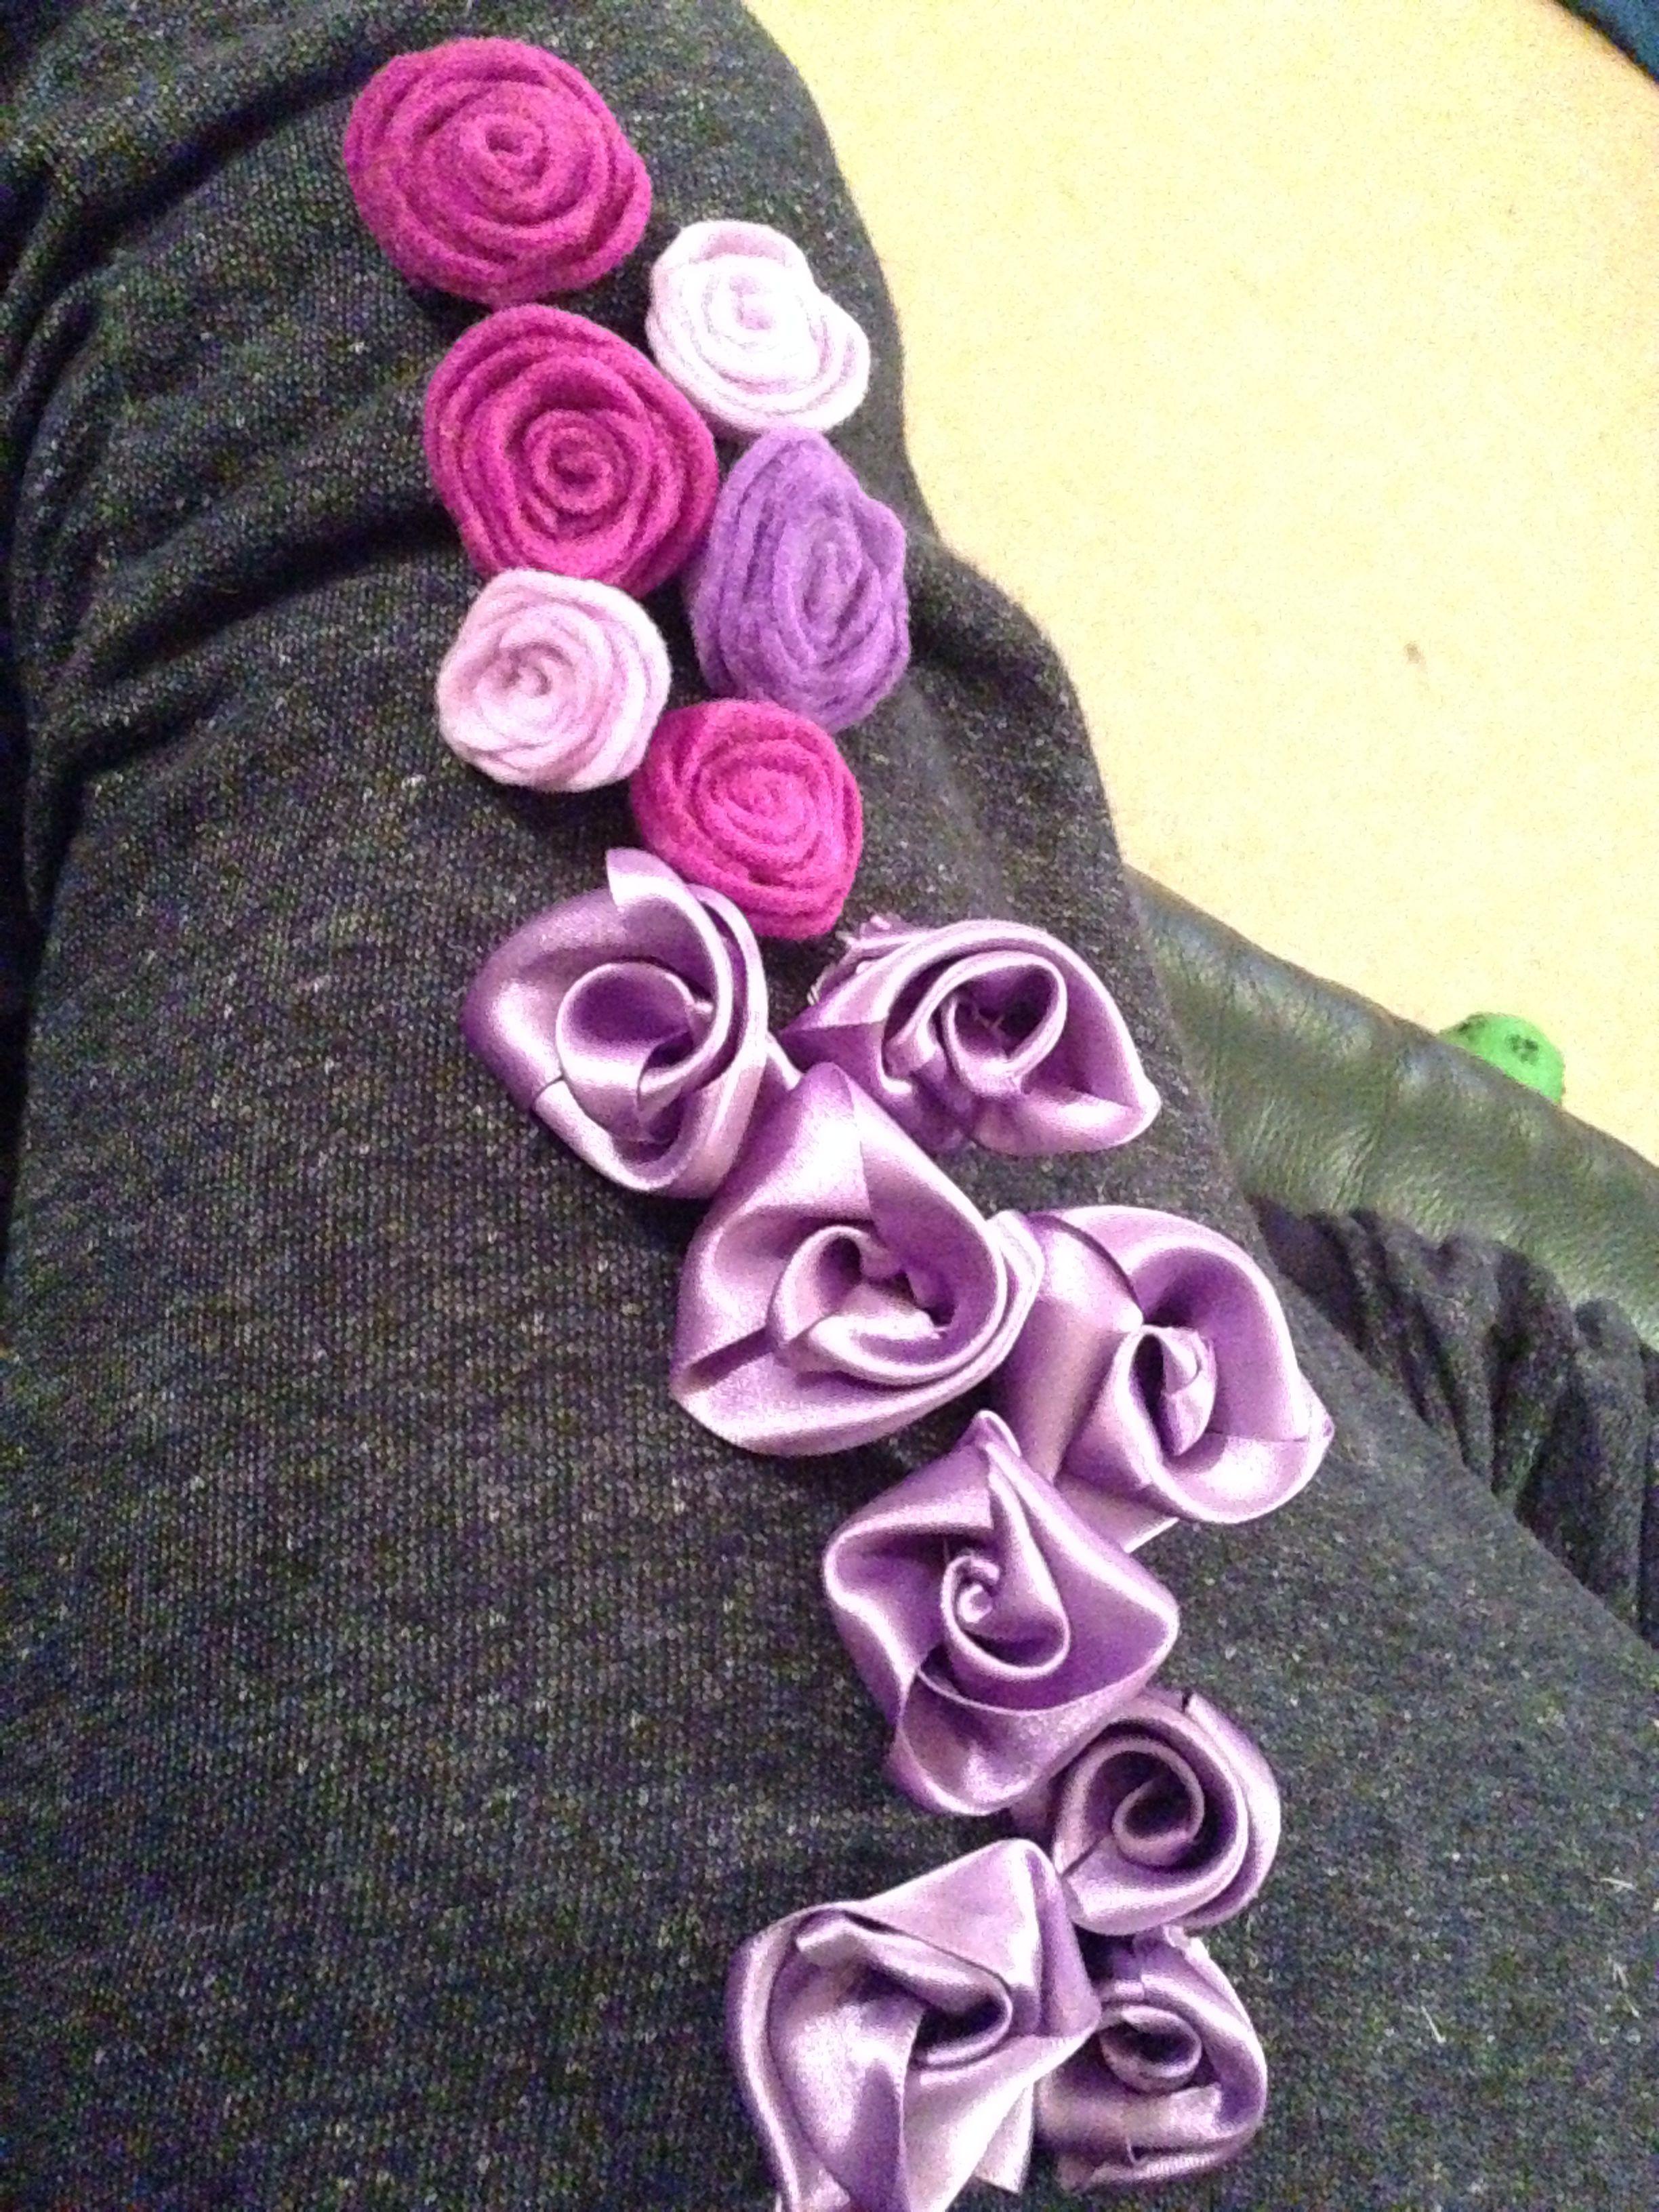 Handmade flowers with satin ribbon and felt